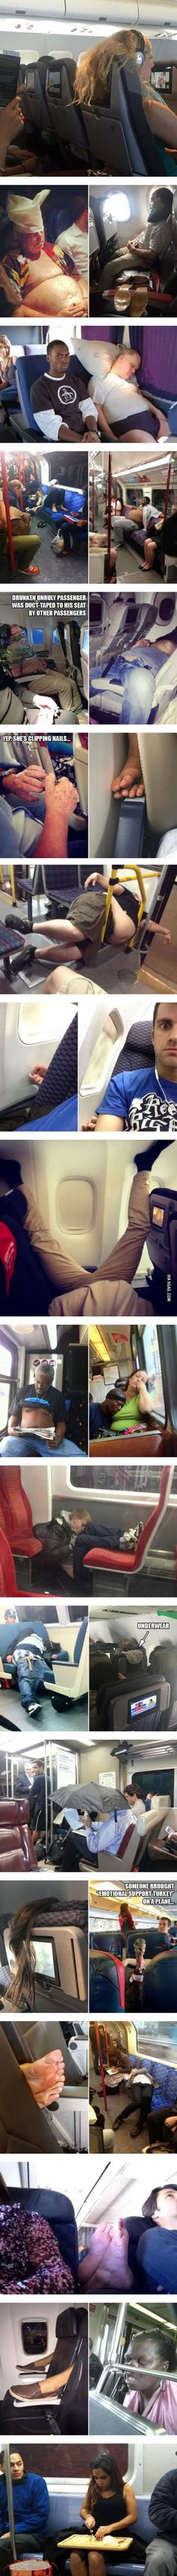 Passengers You DO NOT Want Sitting Near You